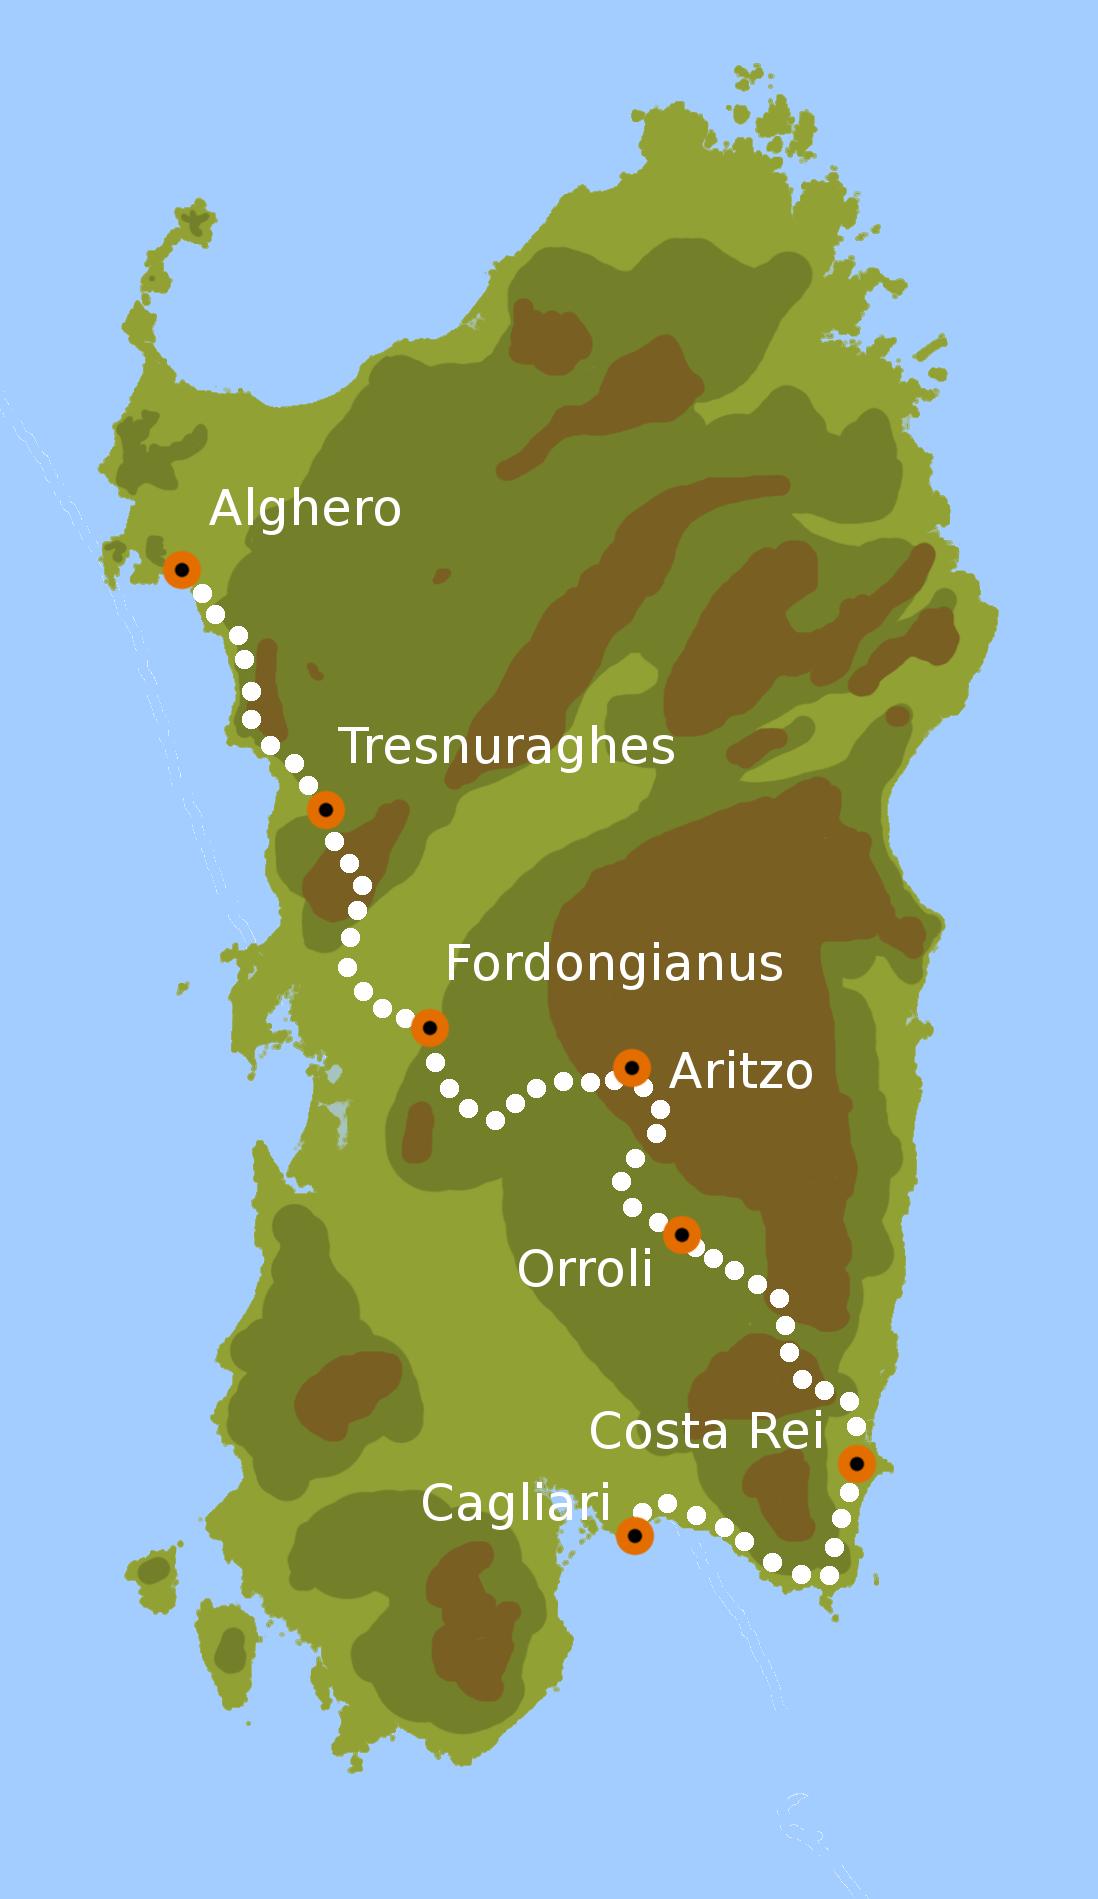 Cartina Sardegna Alghero.From Alghero To Cagliari By Bike West To East